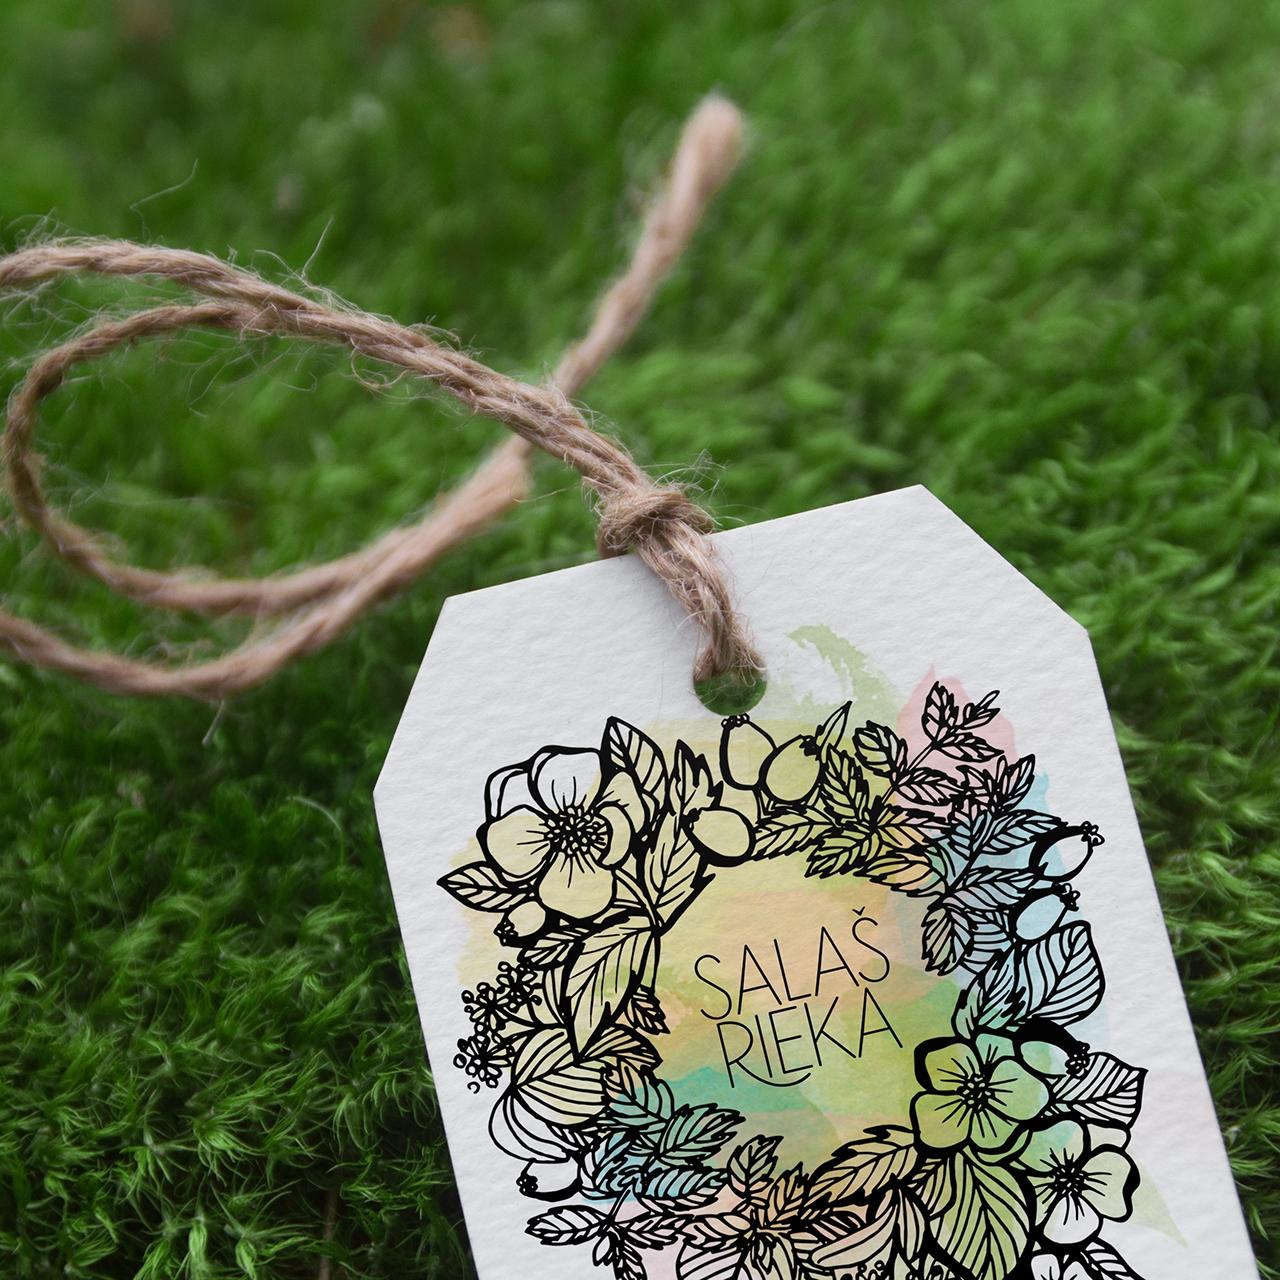 Salaš Rieka logo design and paper tags